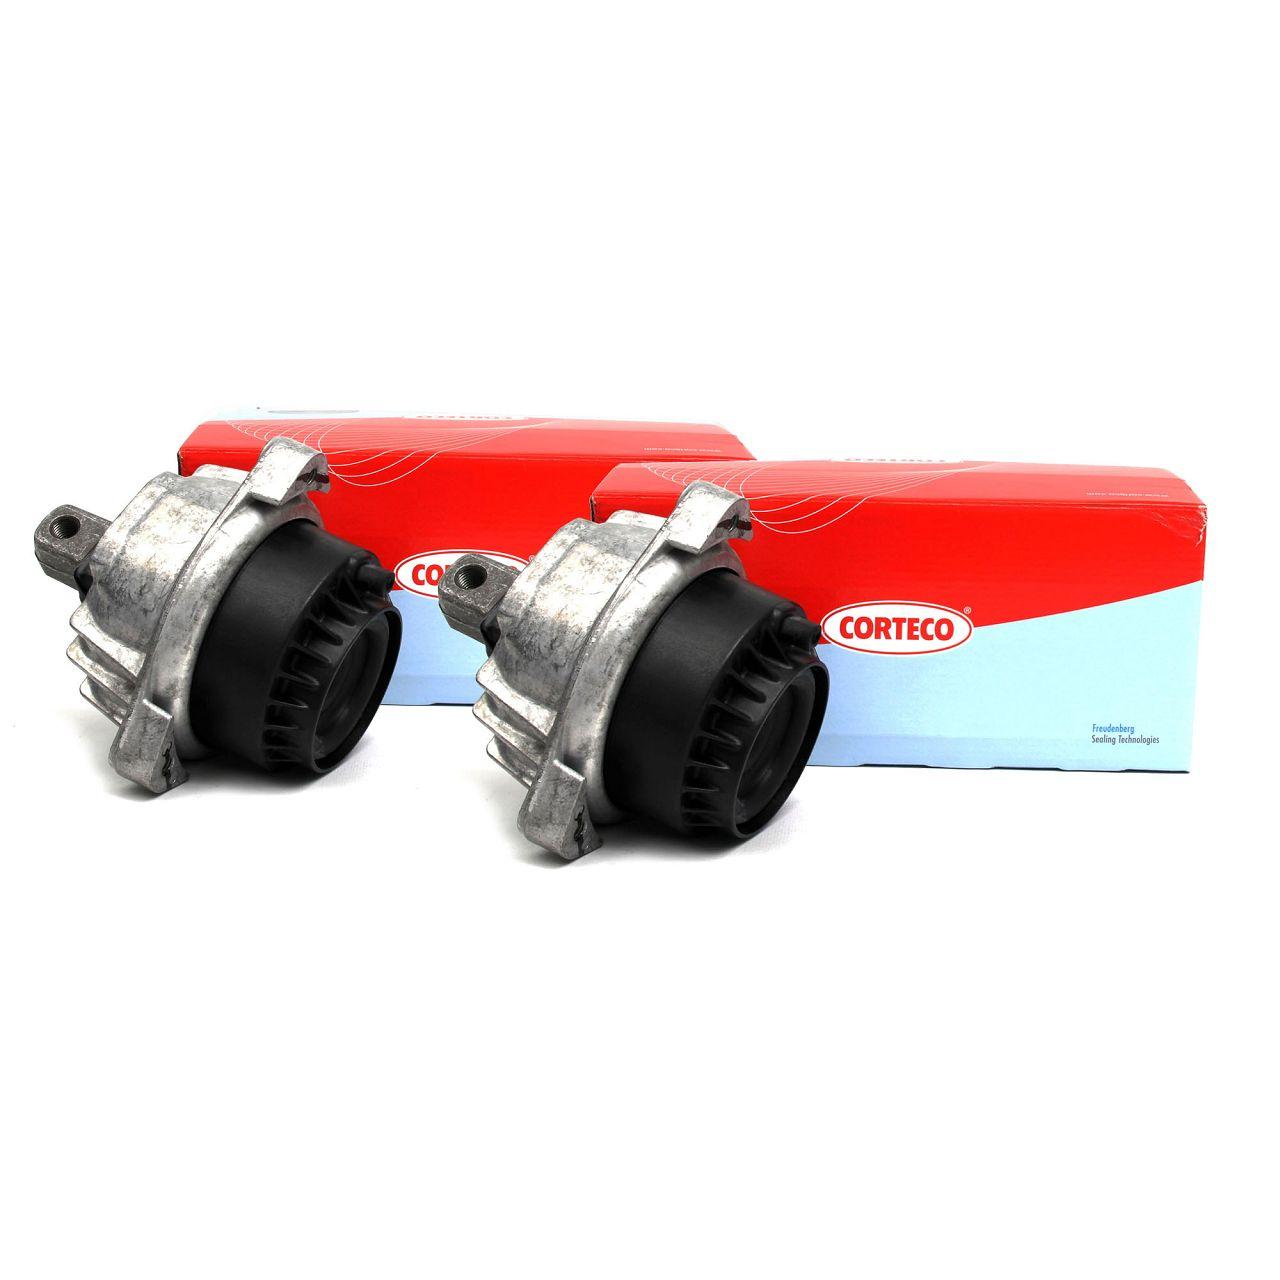 2x CORTECO Motorlager Hydrolager für BMW 5er F10 F11 F07 6er F12 F06 7er F01-04